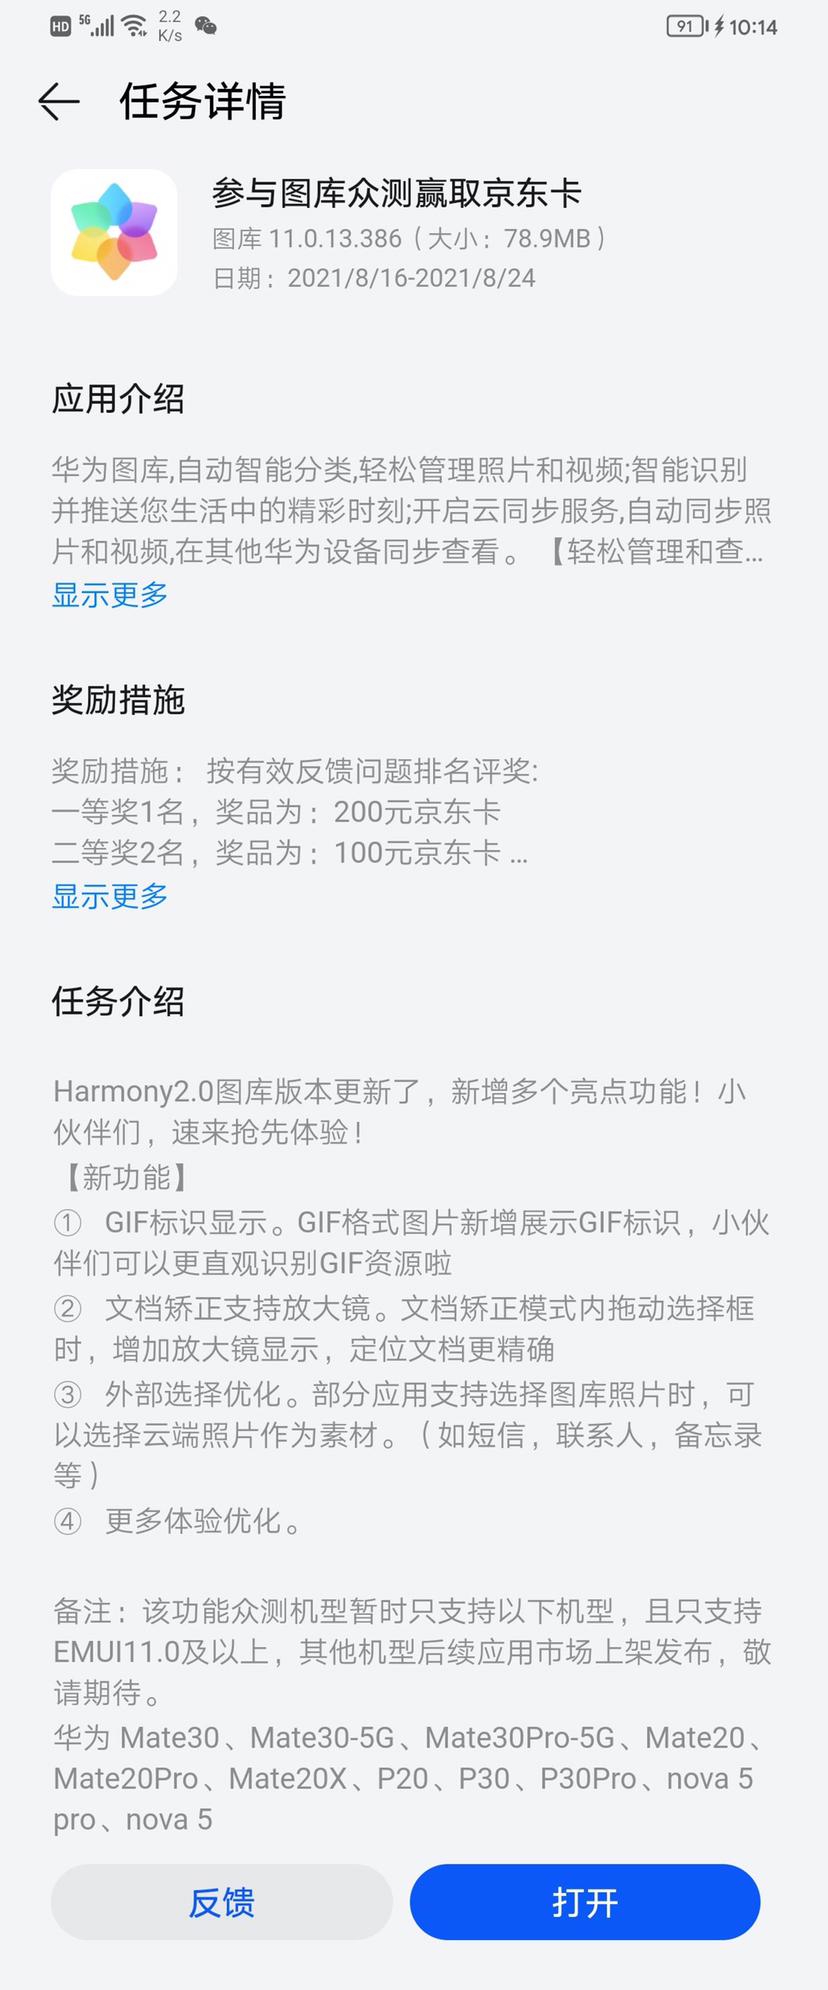 HarmonyOS 2 Gallery